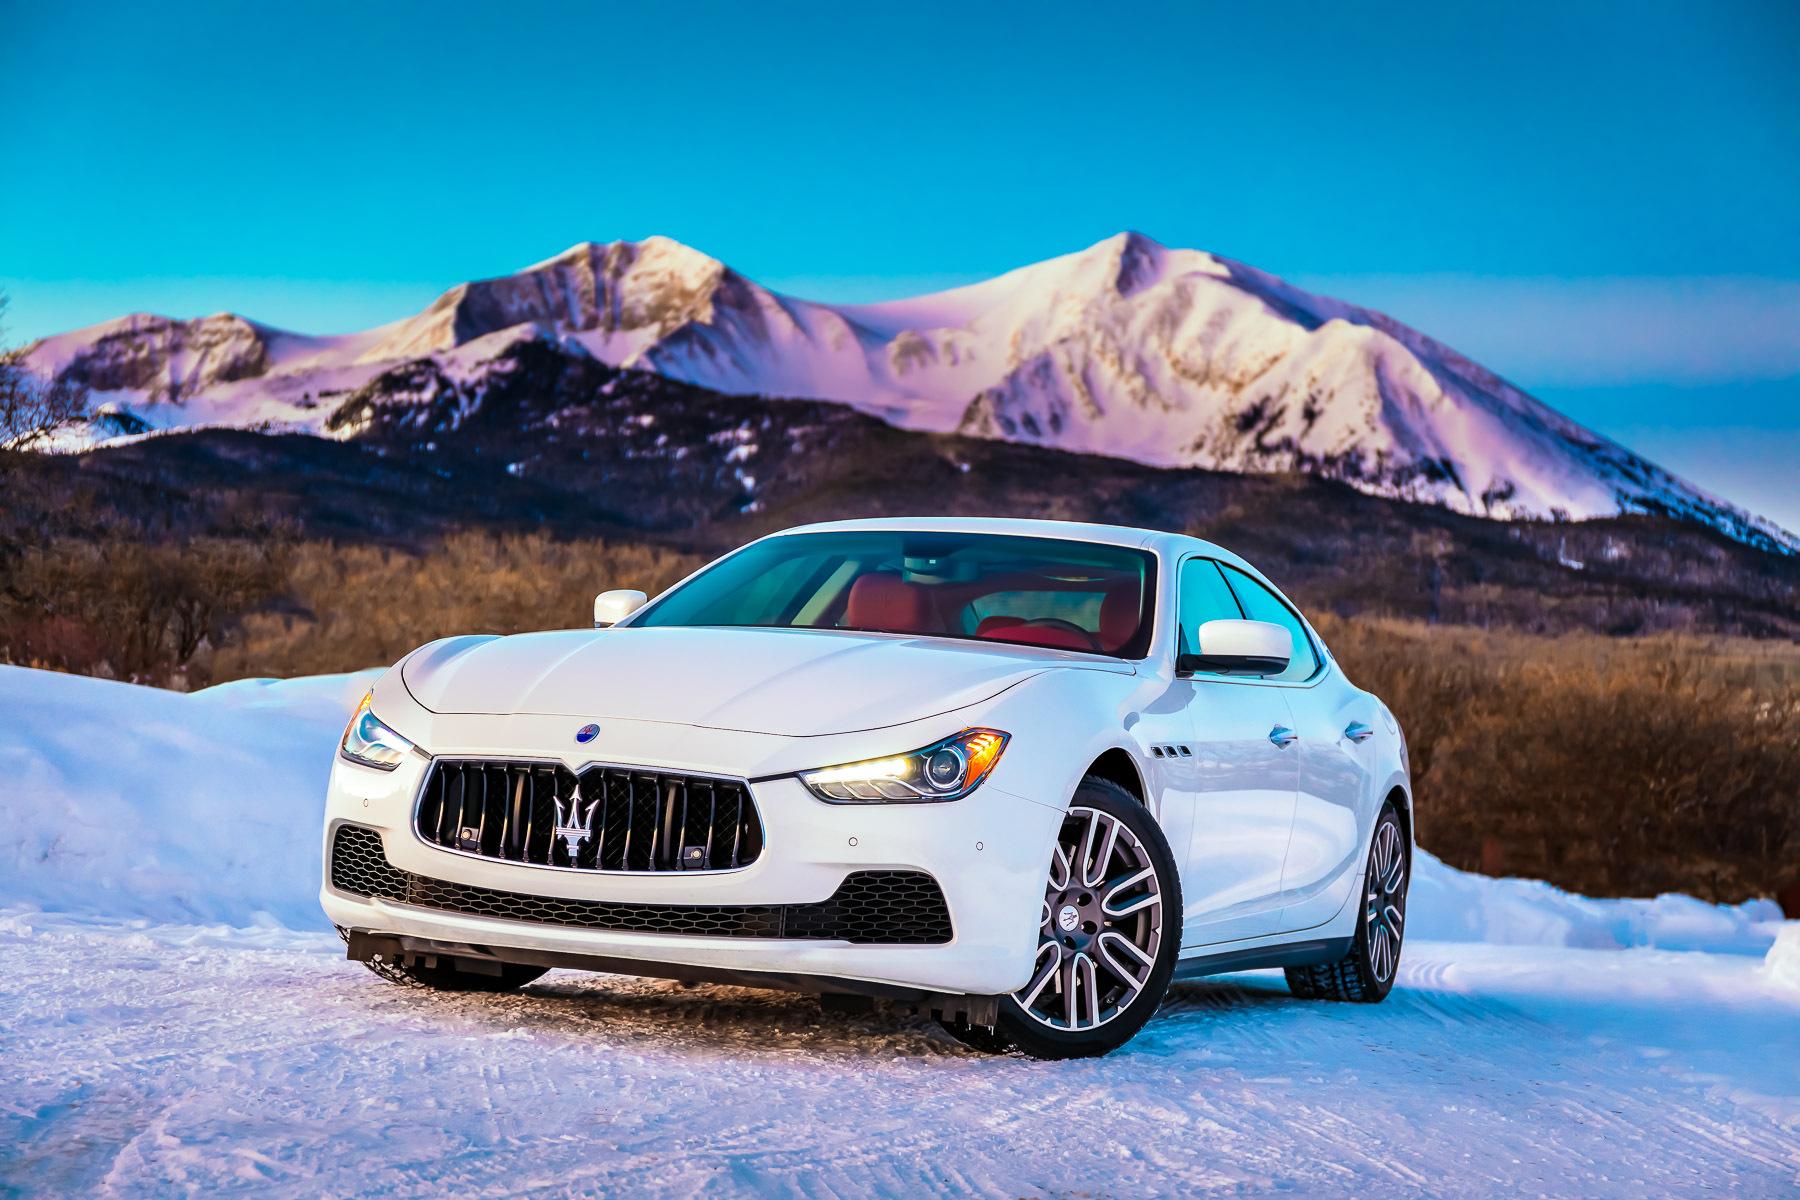 Maserati Ghibli, Aspen, CO